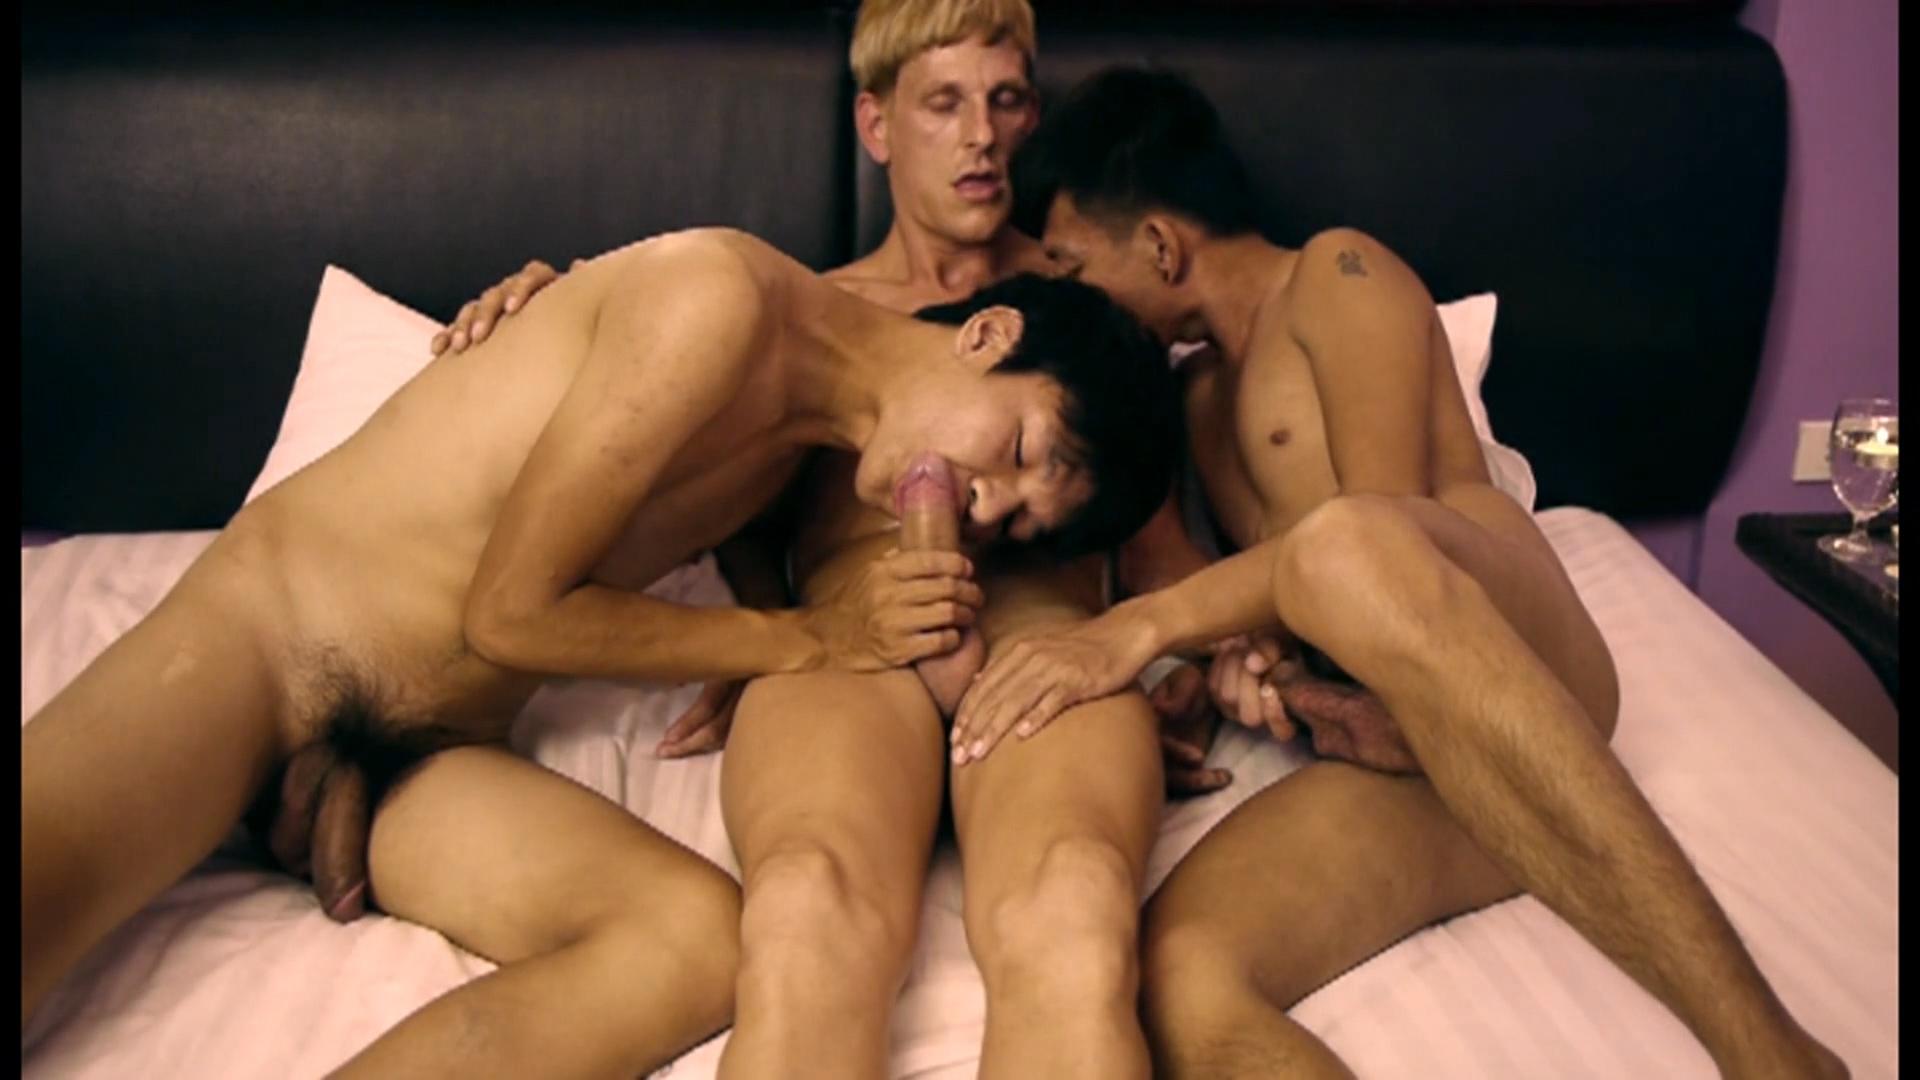 Dominic, Thomas and Jason